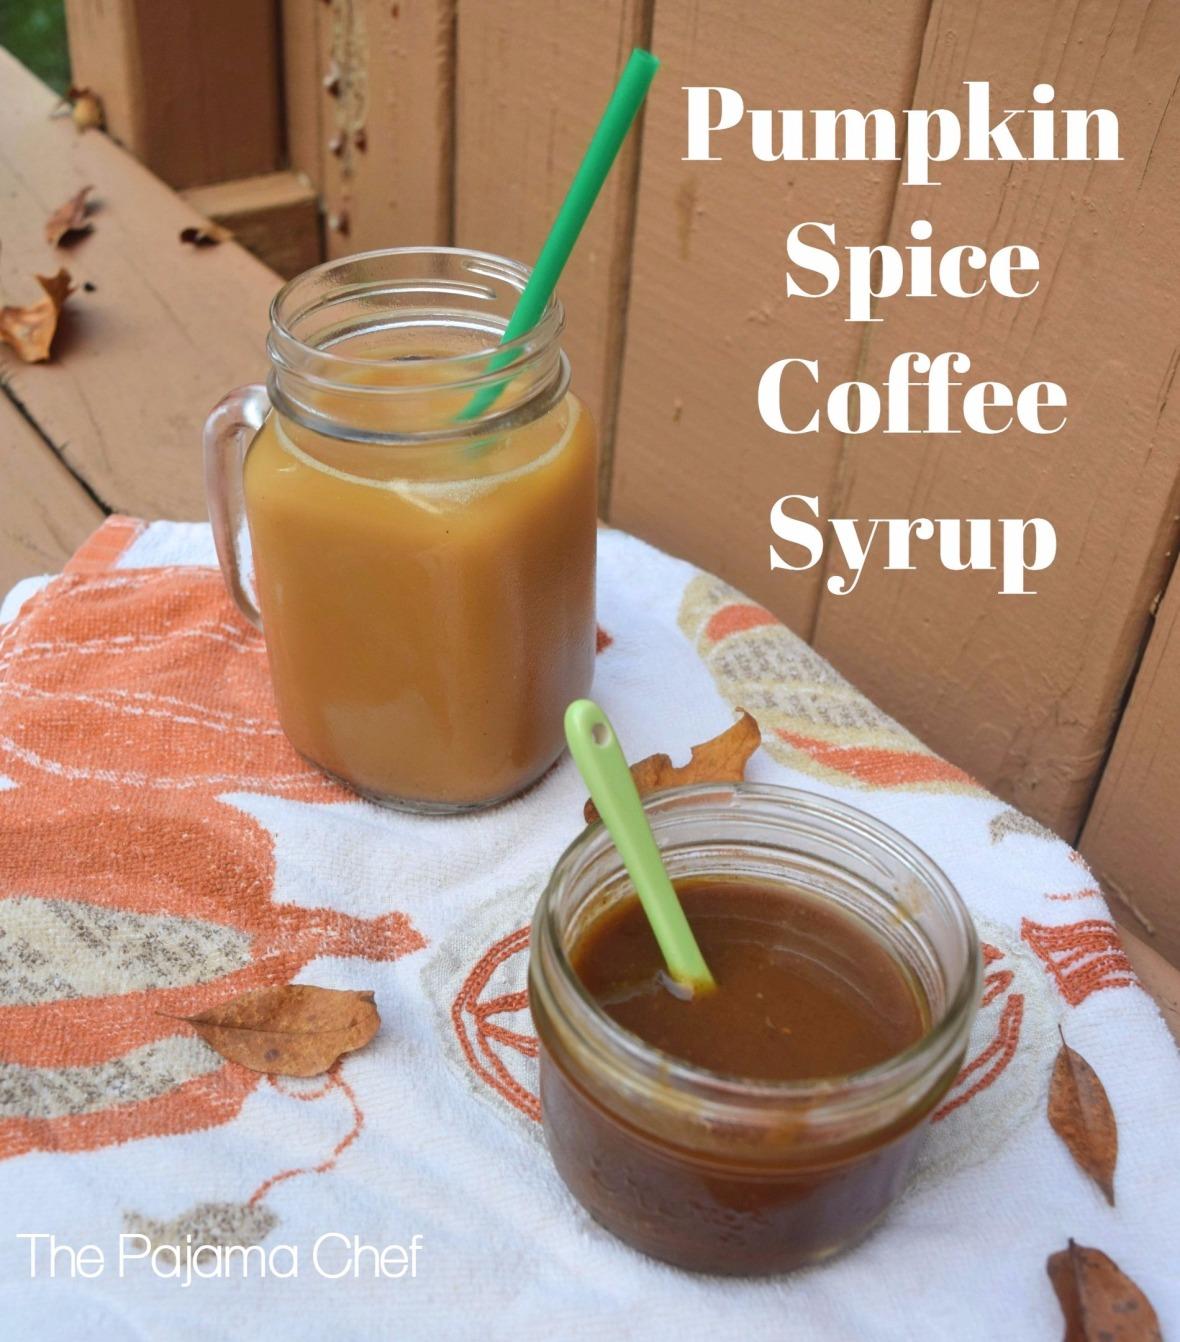 Pumpkin Spice Coffee Syrup + Cold Brew Coffee Method #steviva #sweetandeasy| thepajamachef.com